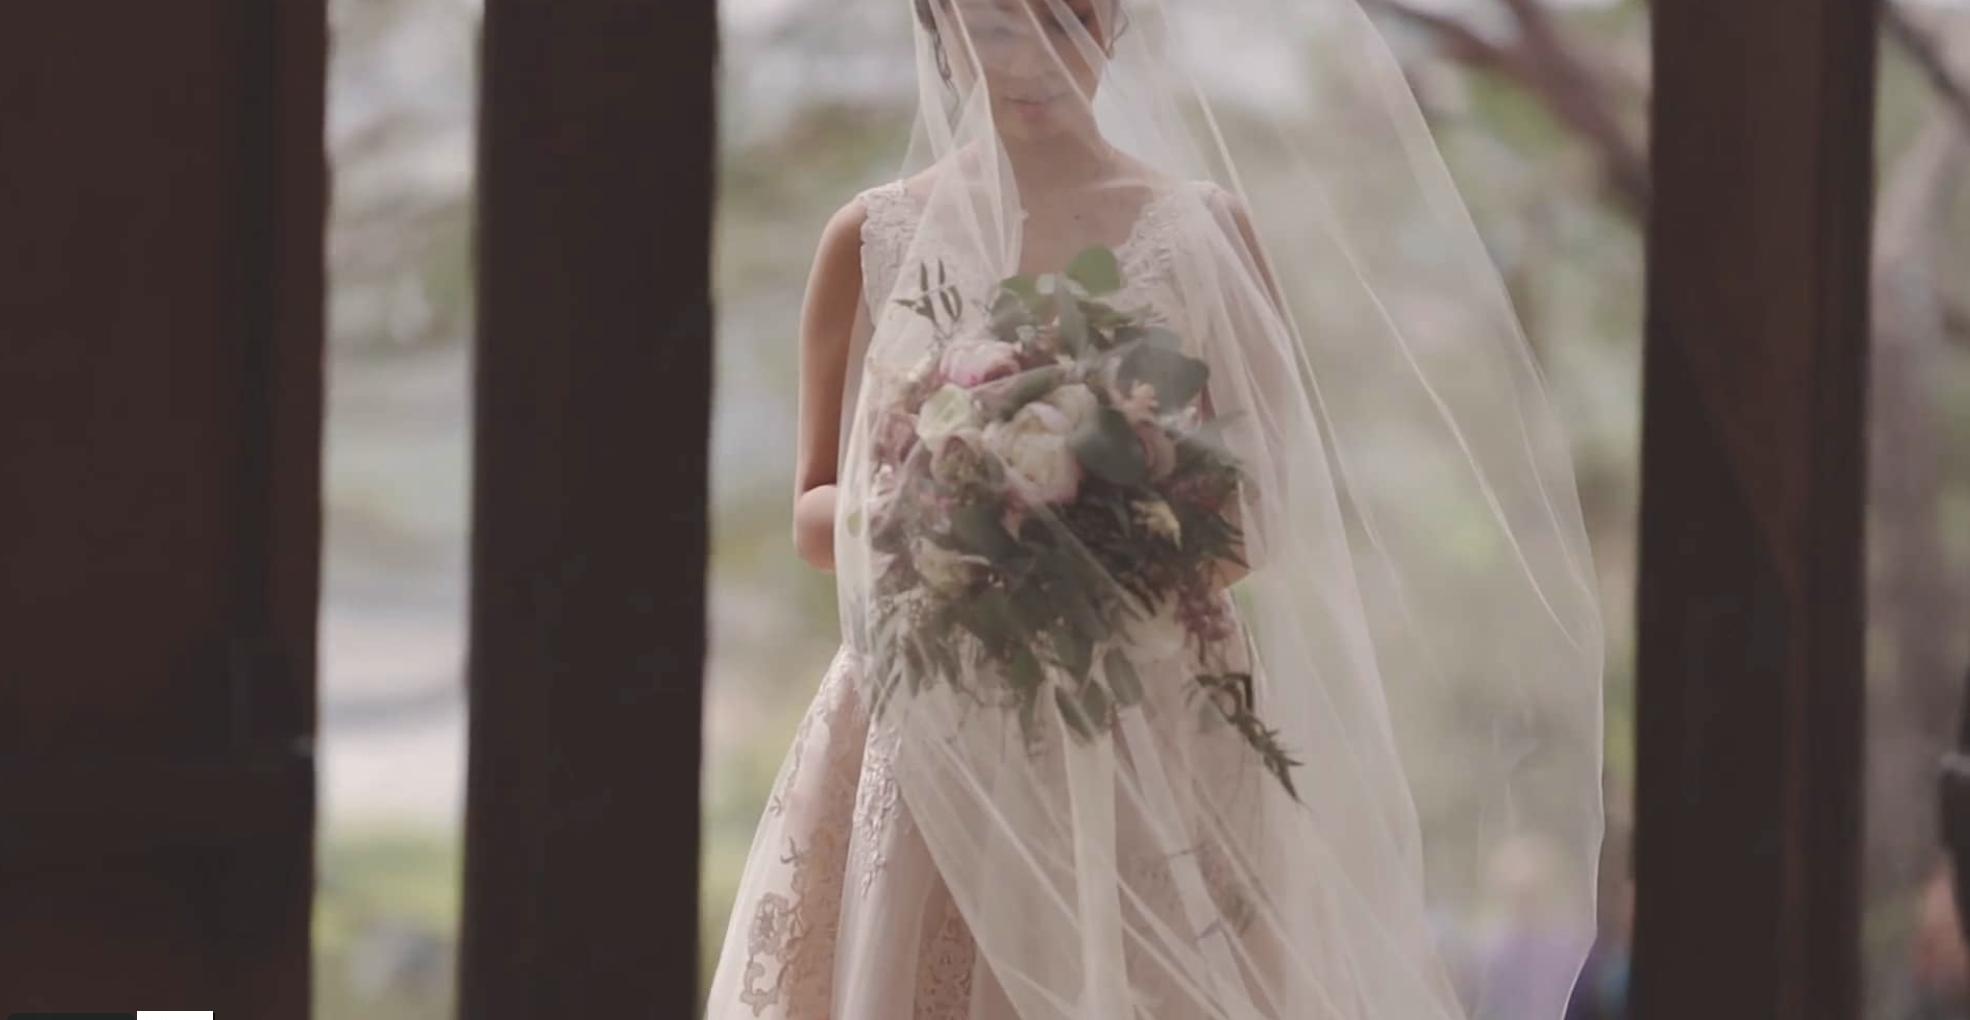 Terranea Resort/ Wayfarer's Chapel/ Carondelet House | Ma Theresa + Ling Wedding Film